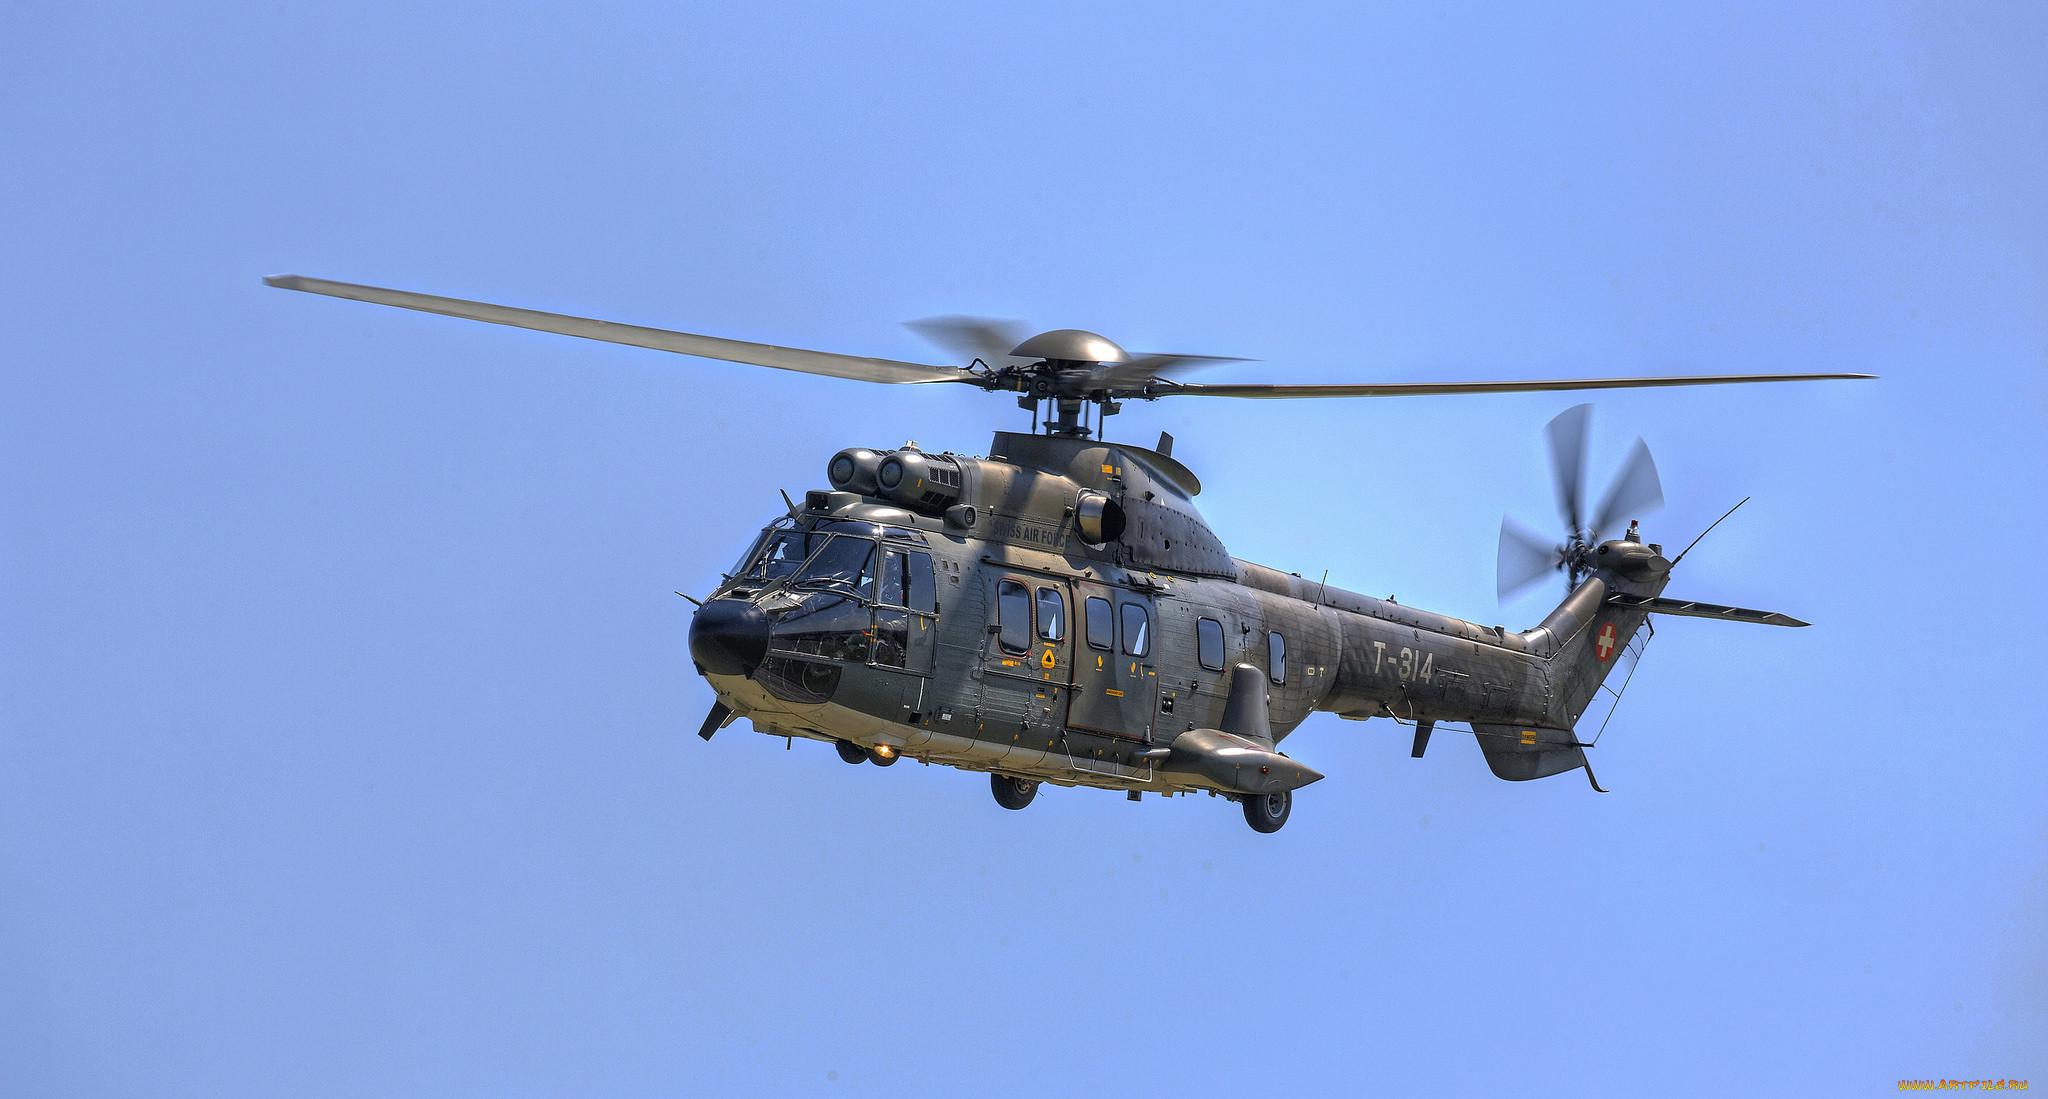 as, 332m1 super puma, авиация, вертолёты, вертушка